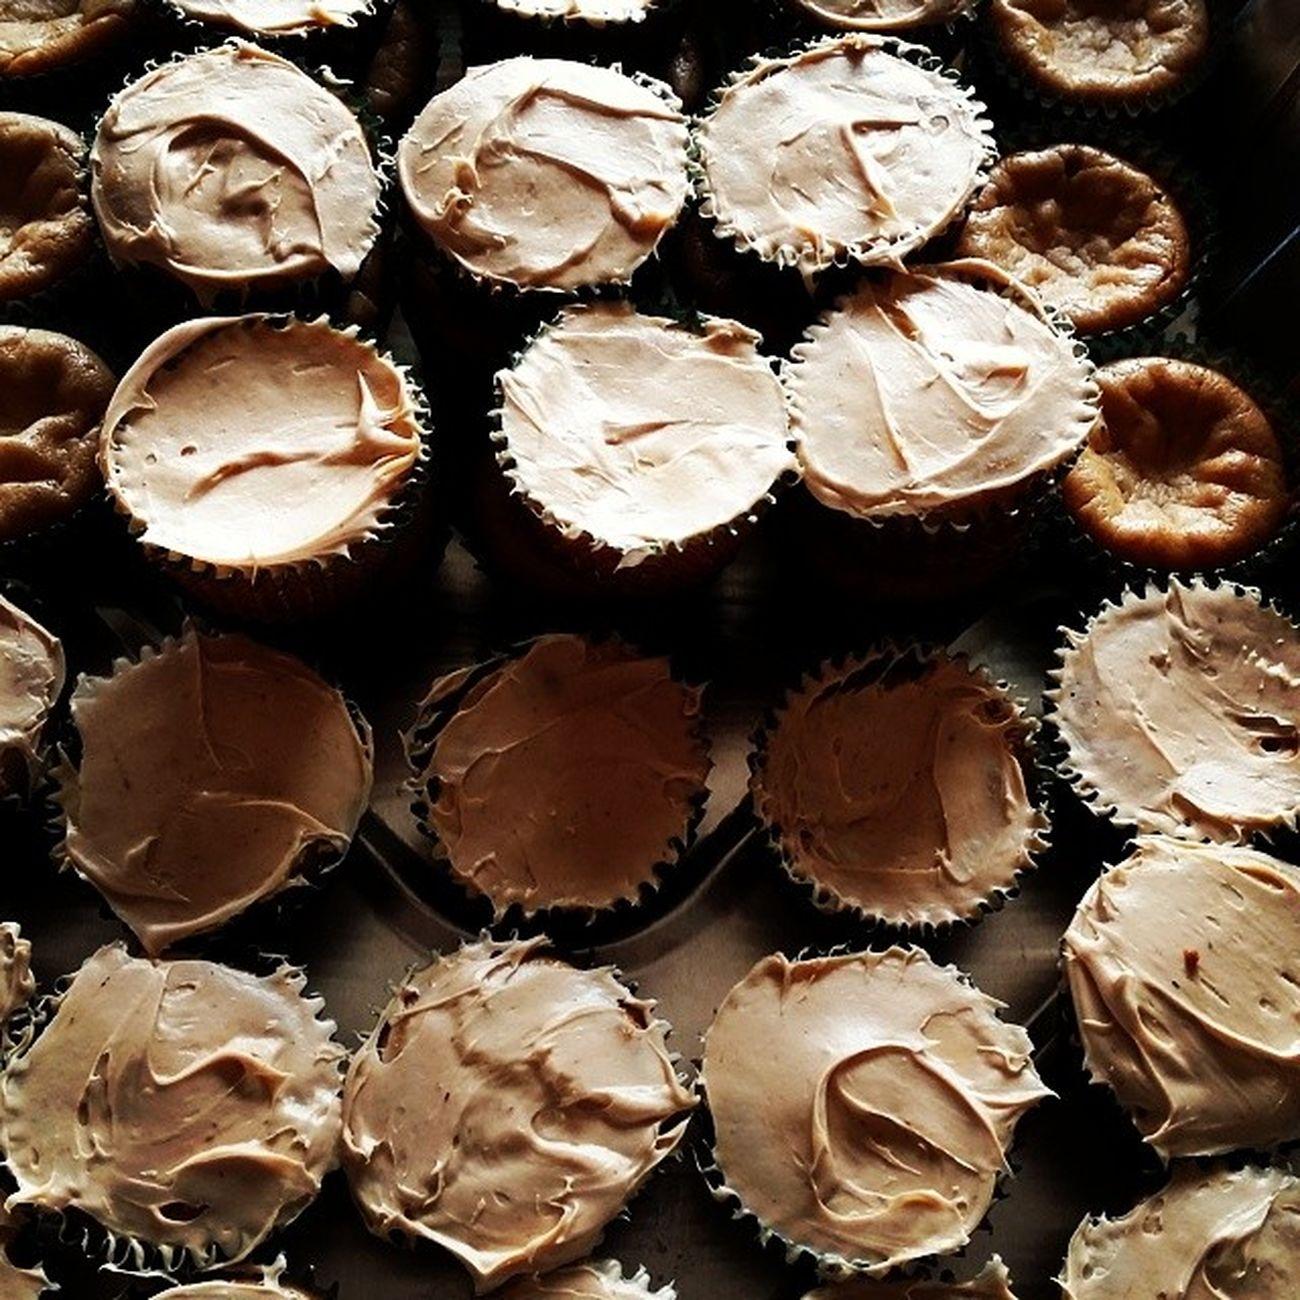 Puertoricanrum Cheesecake with Caramel Frosting Cheesecake Bites